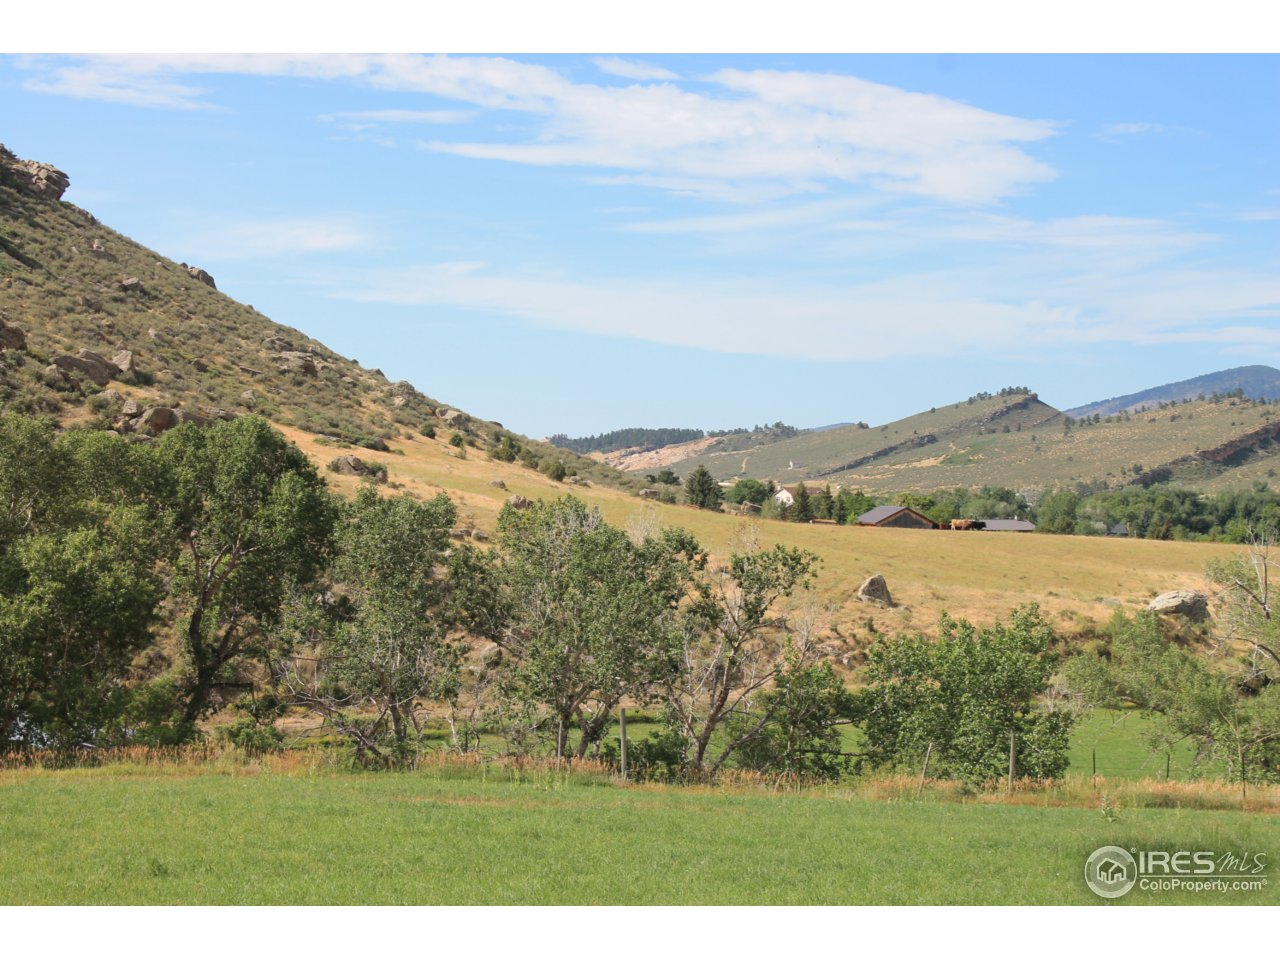 View from 38E towards New Hay Barn